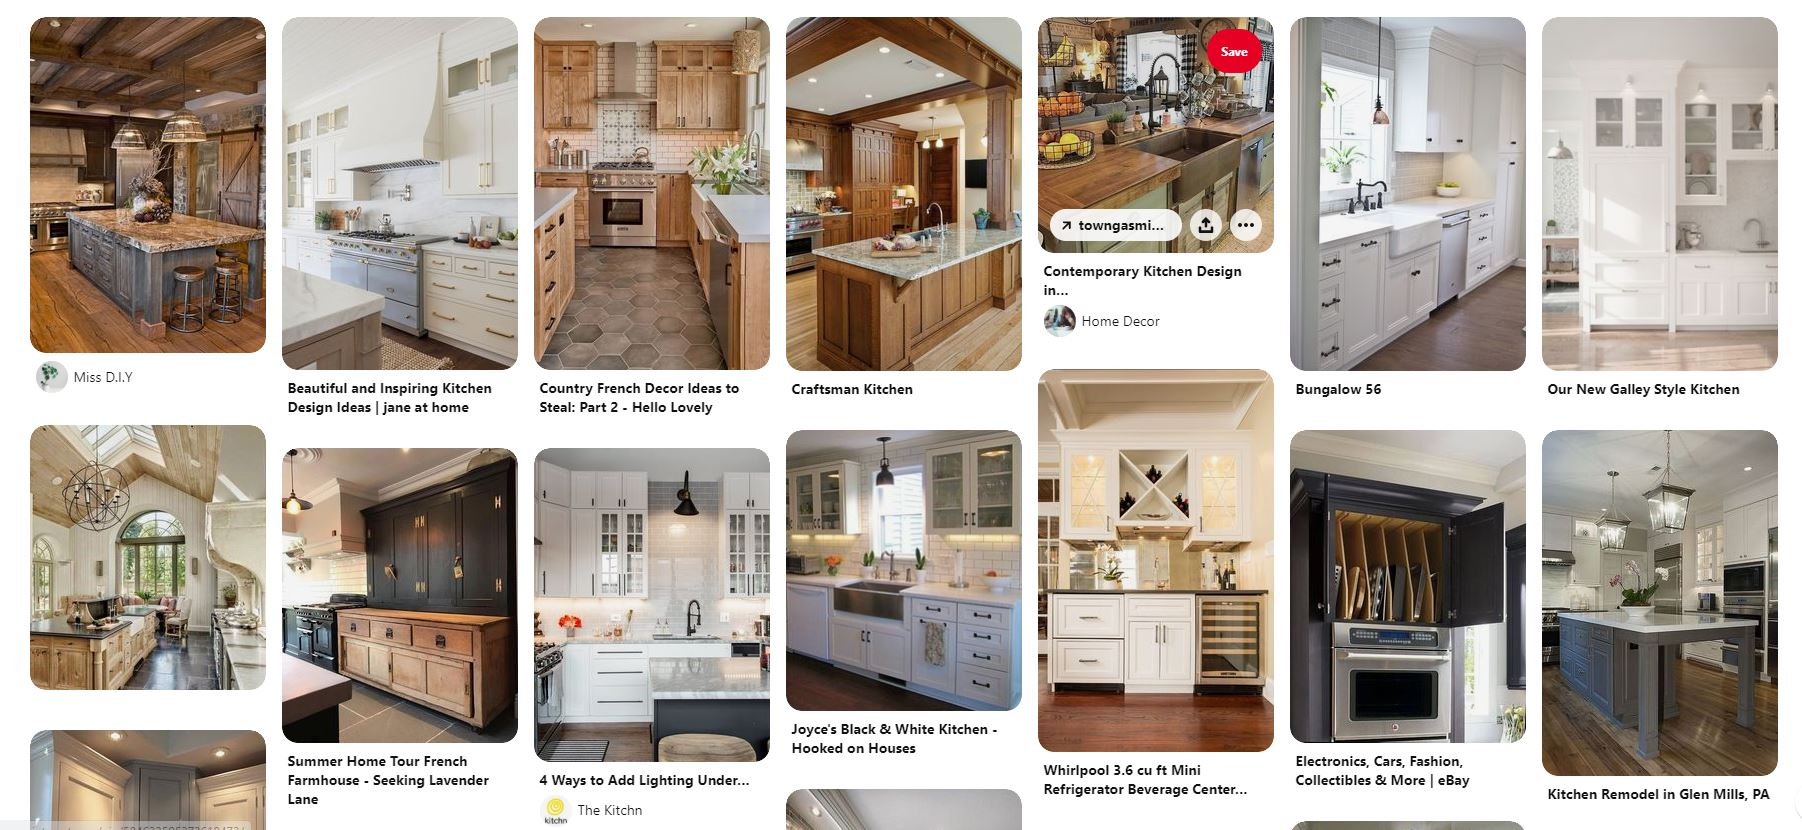 Kitchen-cabinets-pinterest-board-inspiration